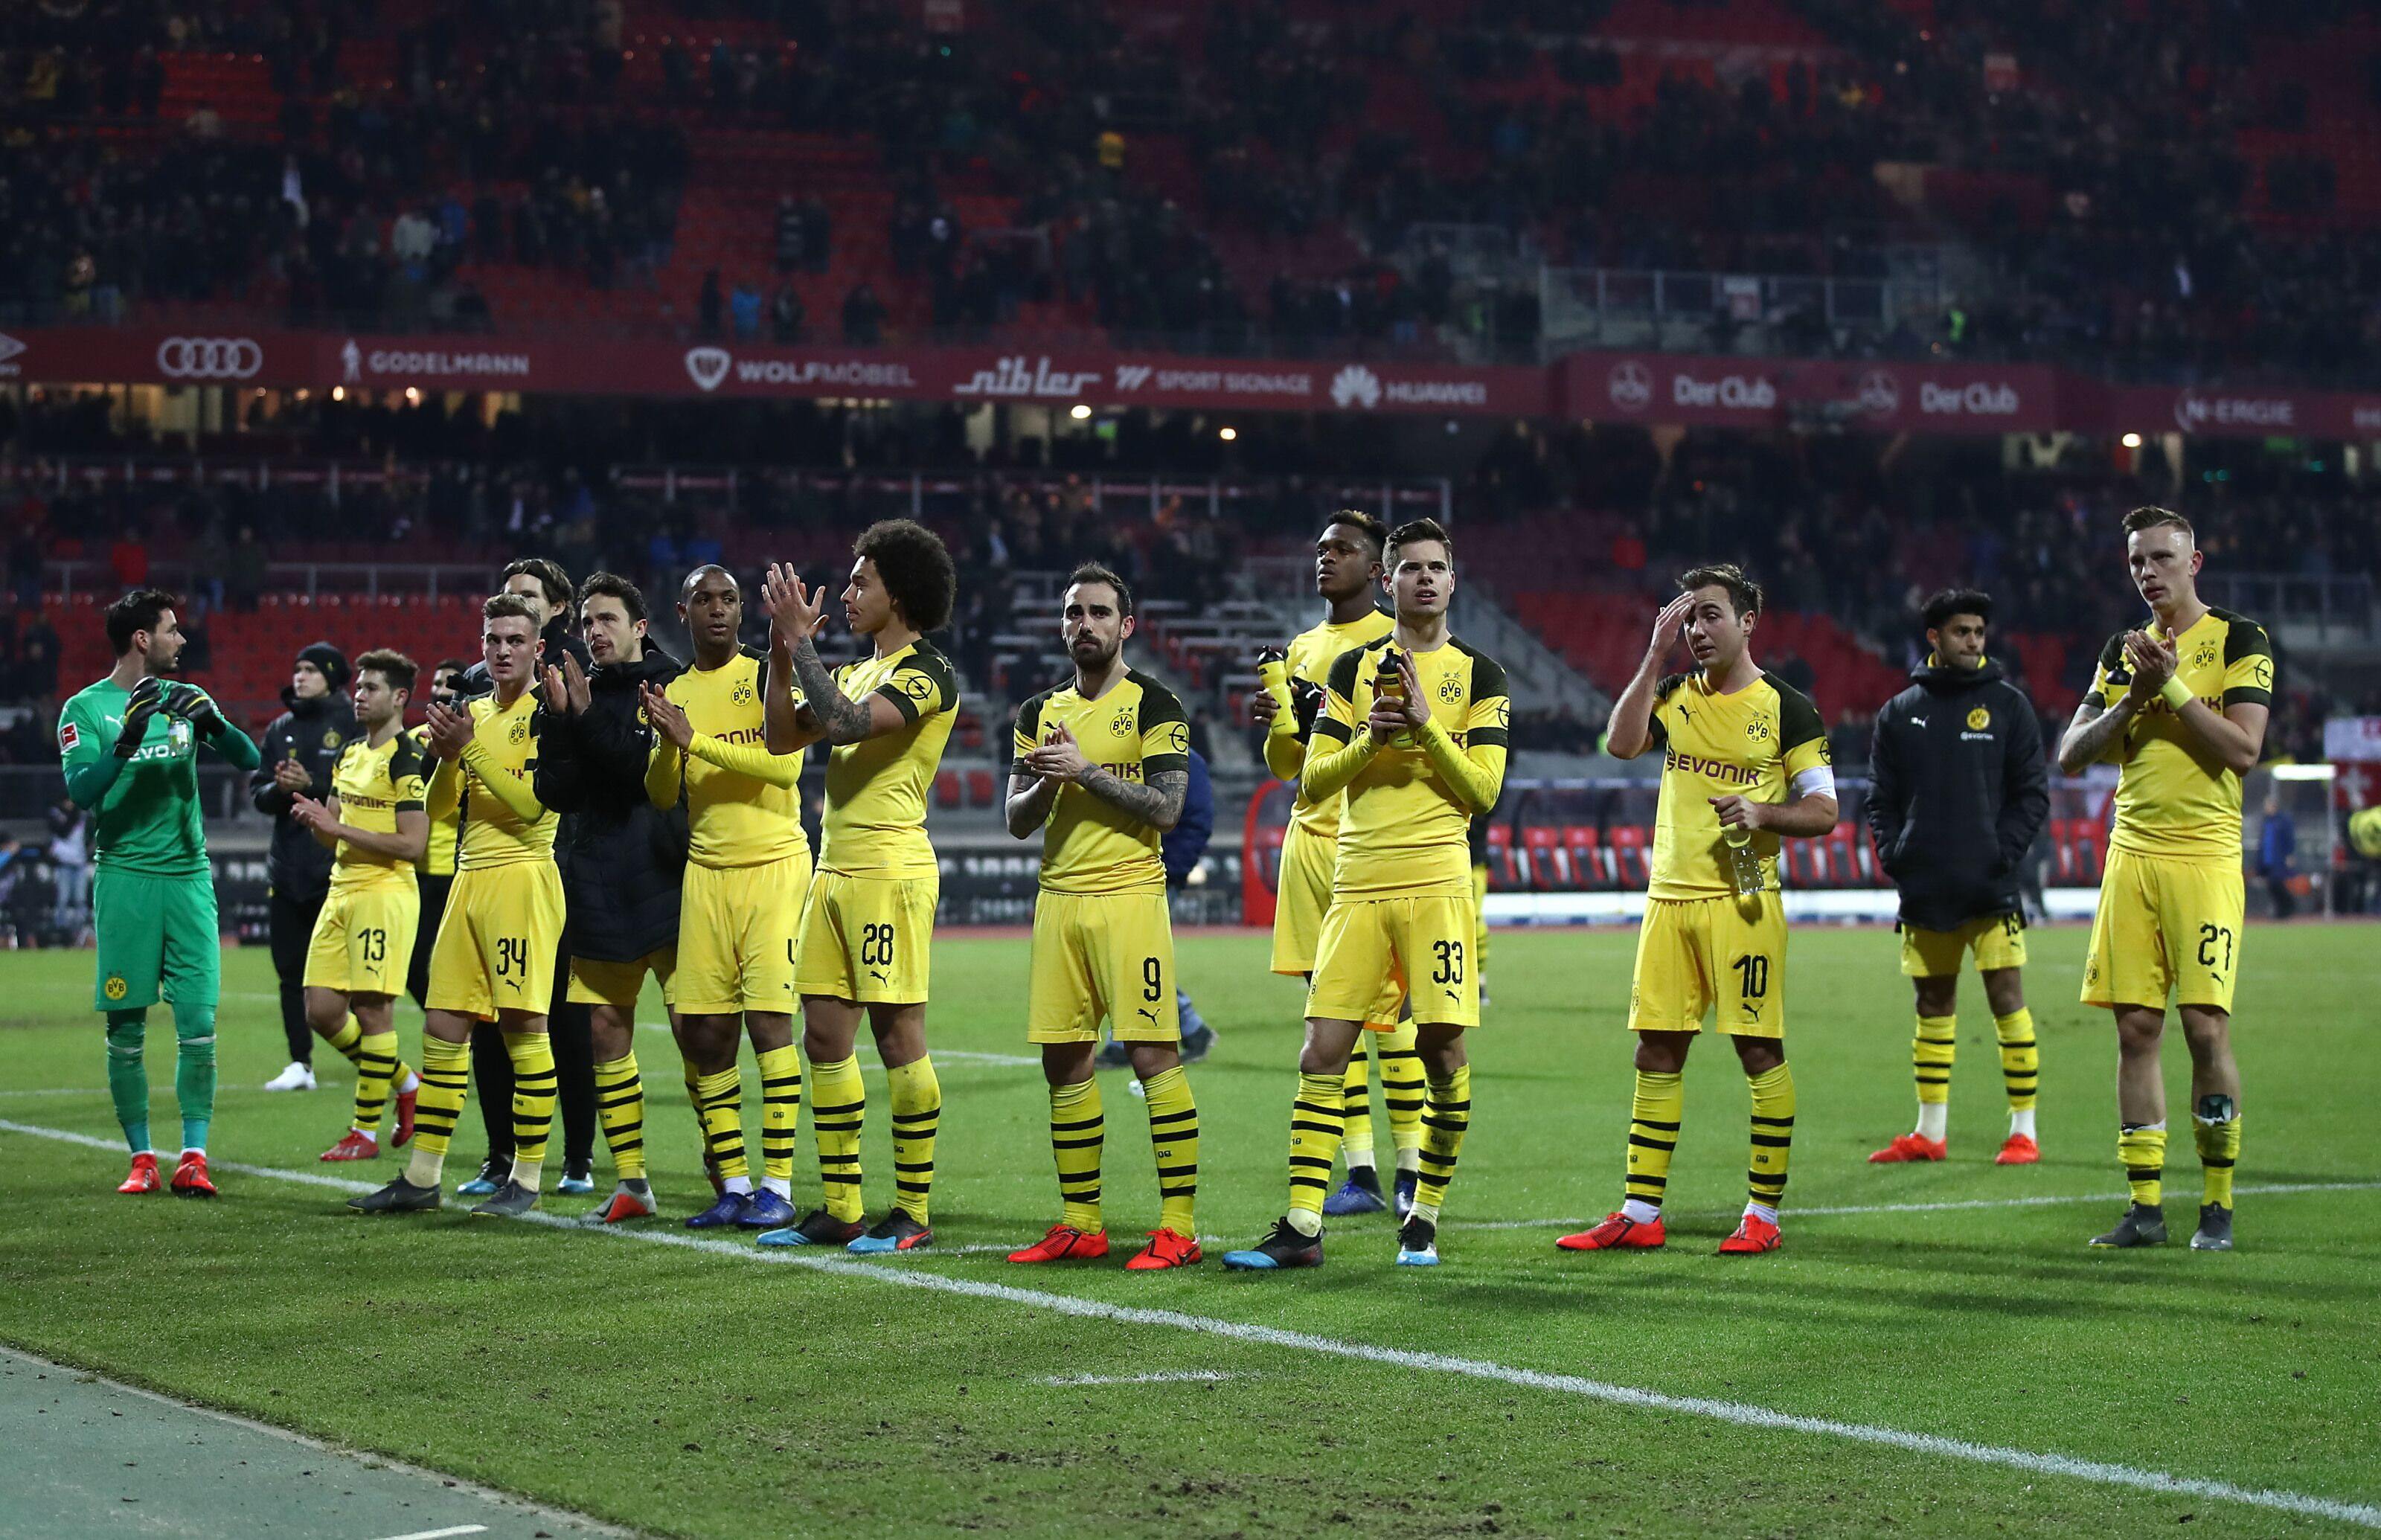 Key Takeaways from Borussia Dortmund's draw against Nürnberg